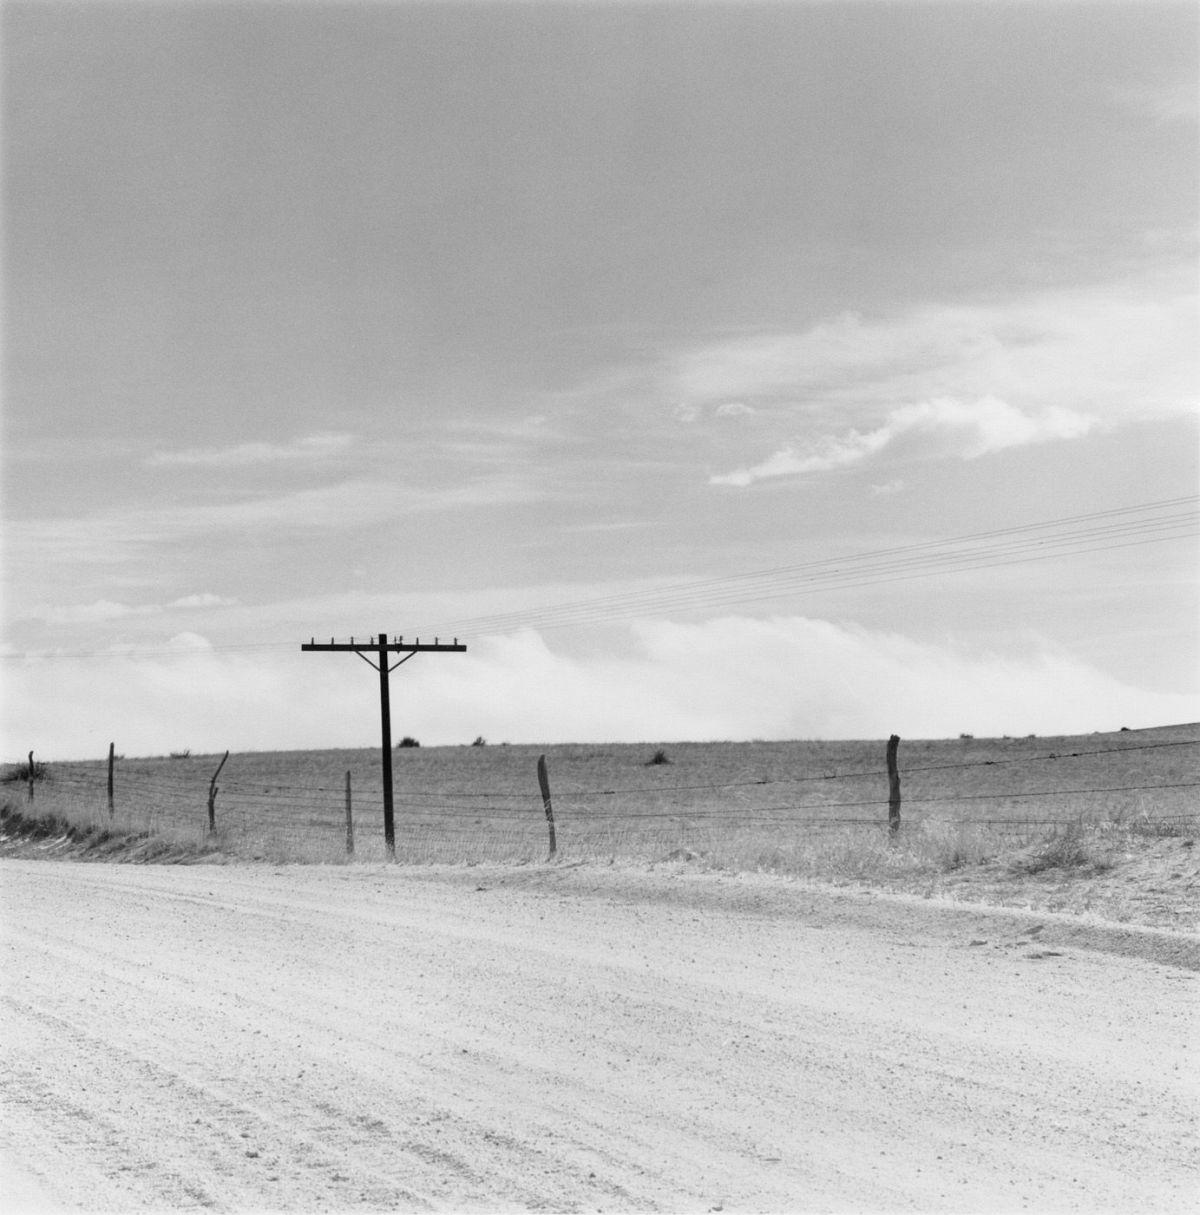 Near Peyton, Colorado, 1969